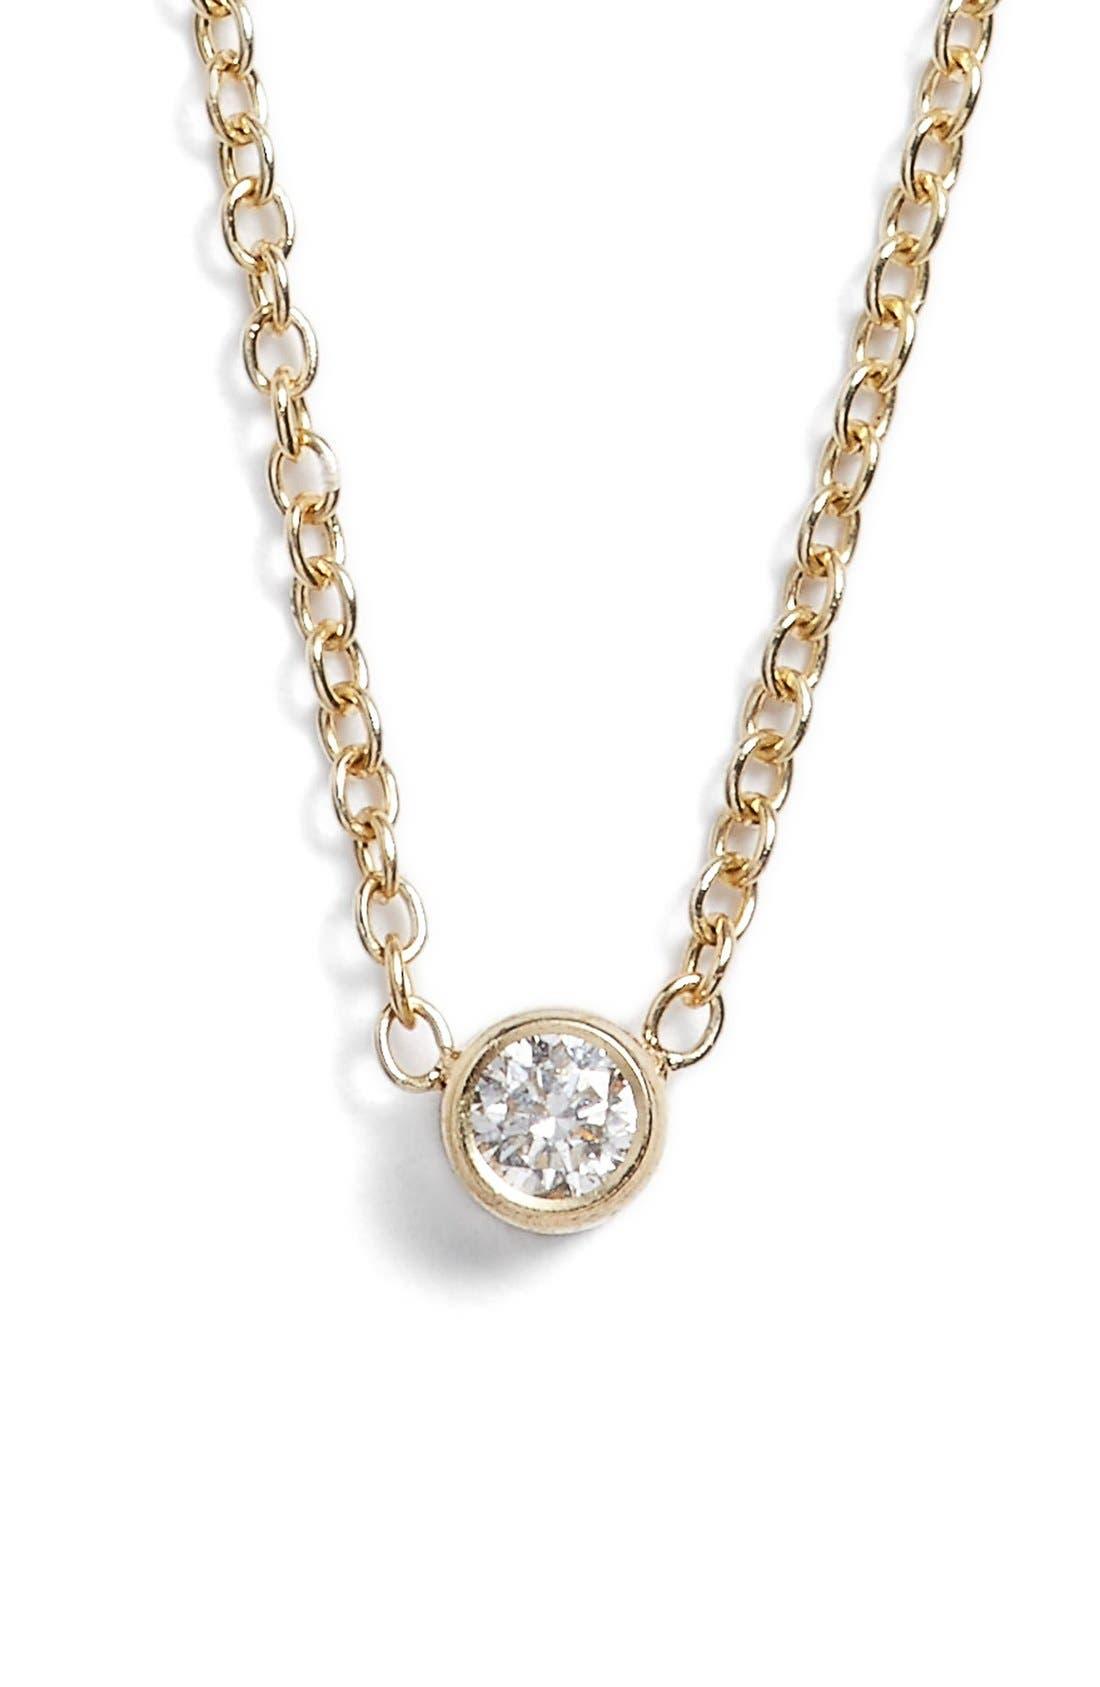 Diamond Bezel Pendant Necklace,                             Main thumbnail 1, color,                             YELLOW GOLD